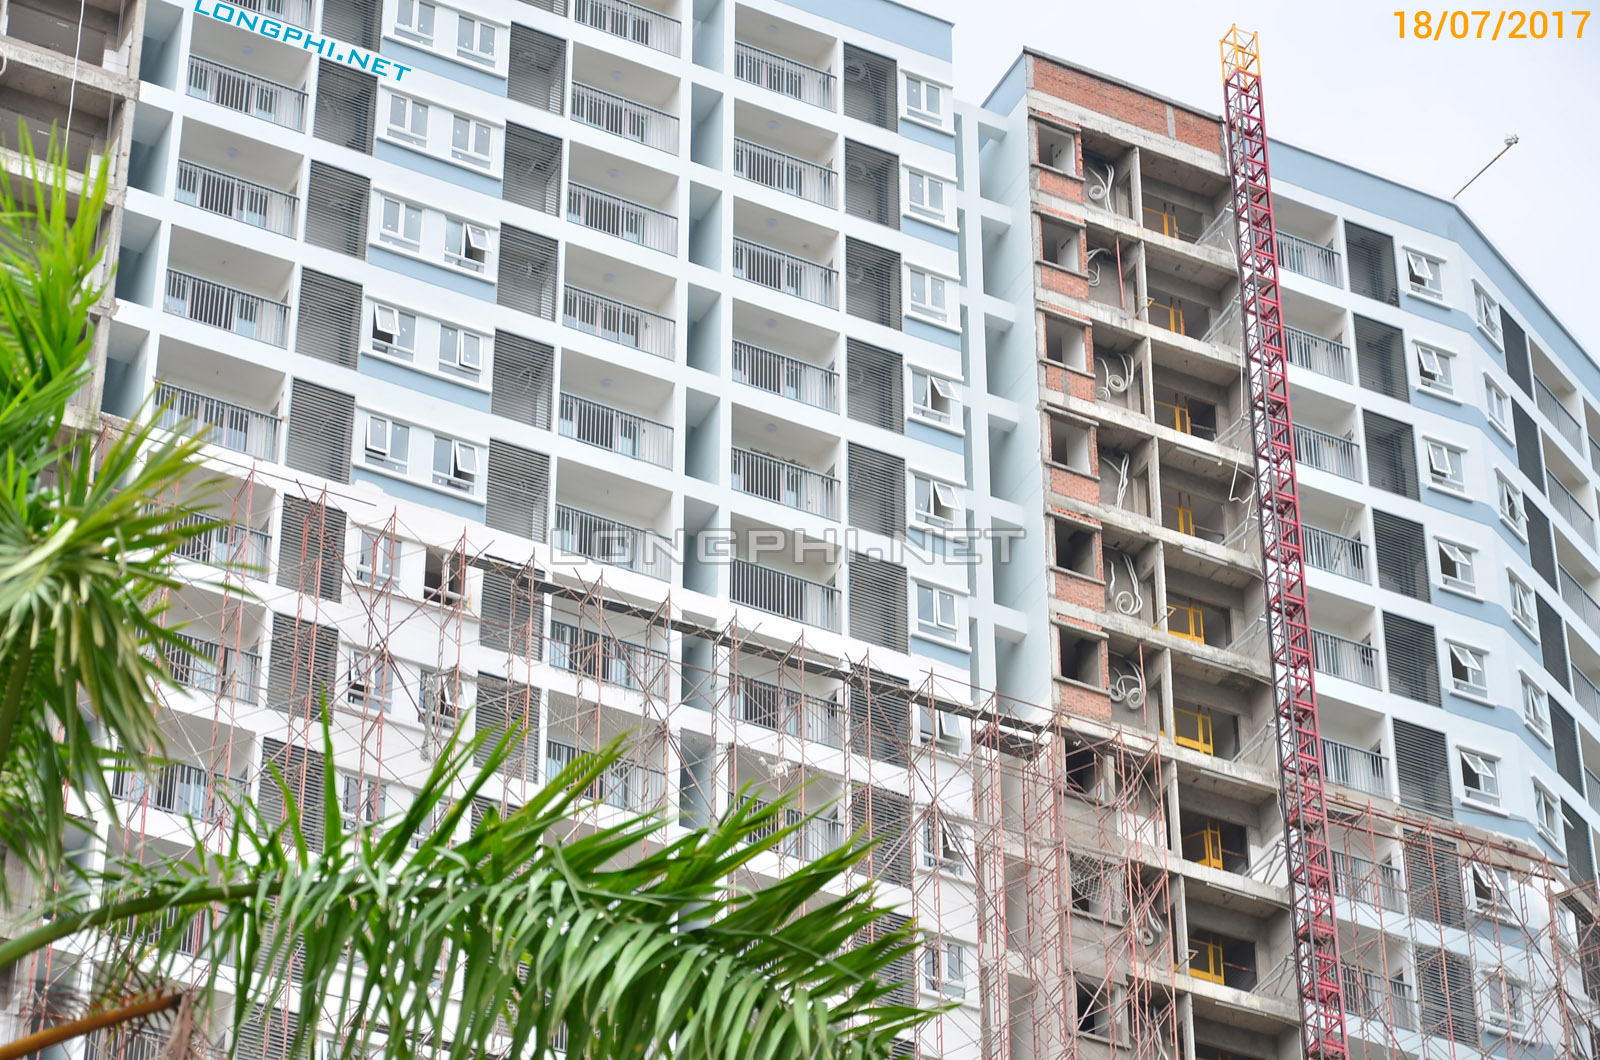 Mặt trong tháp Nam - Jamona Apartment - Luxury Home Q7.